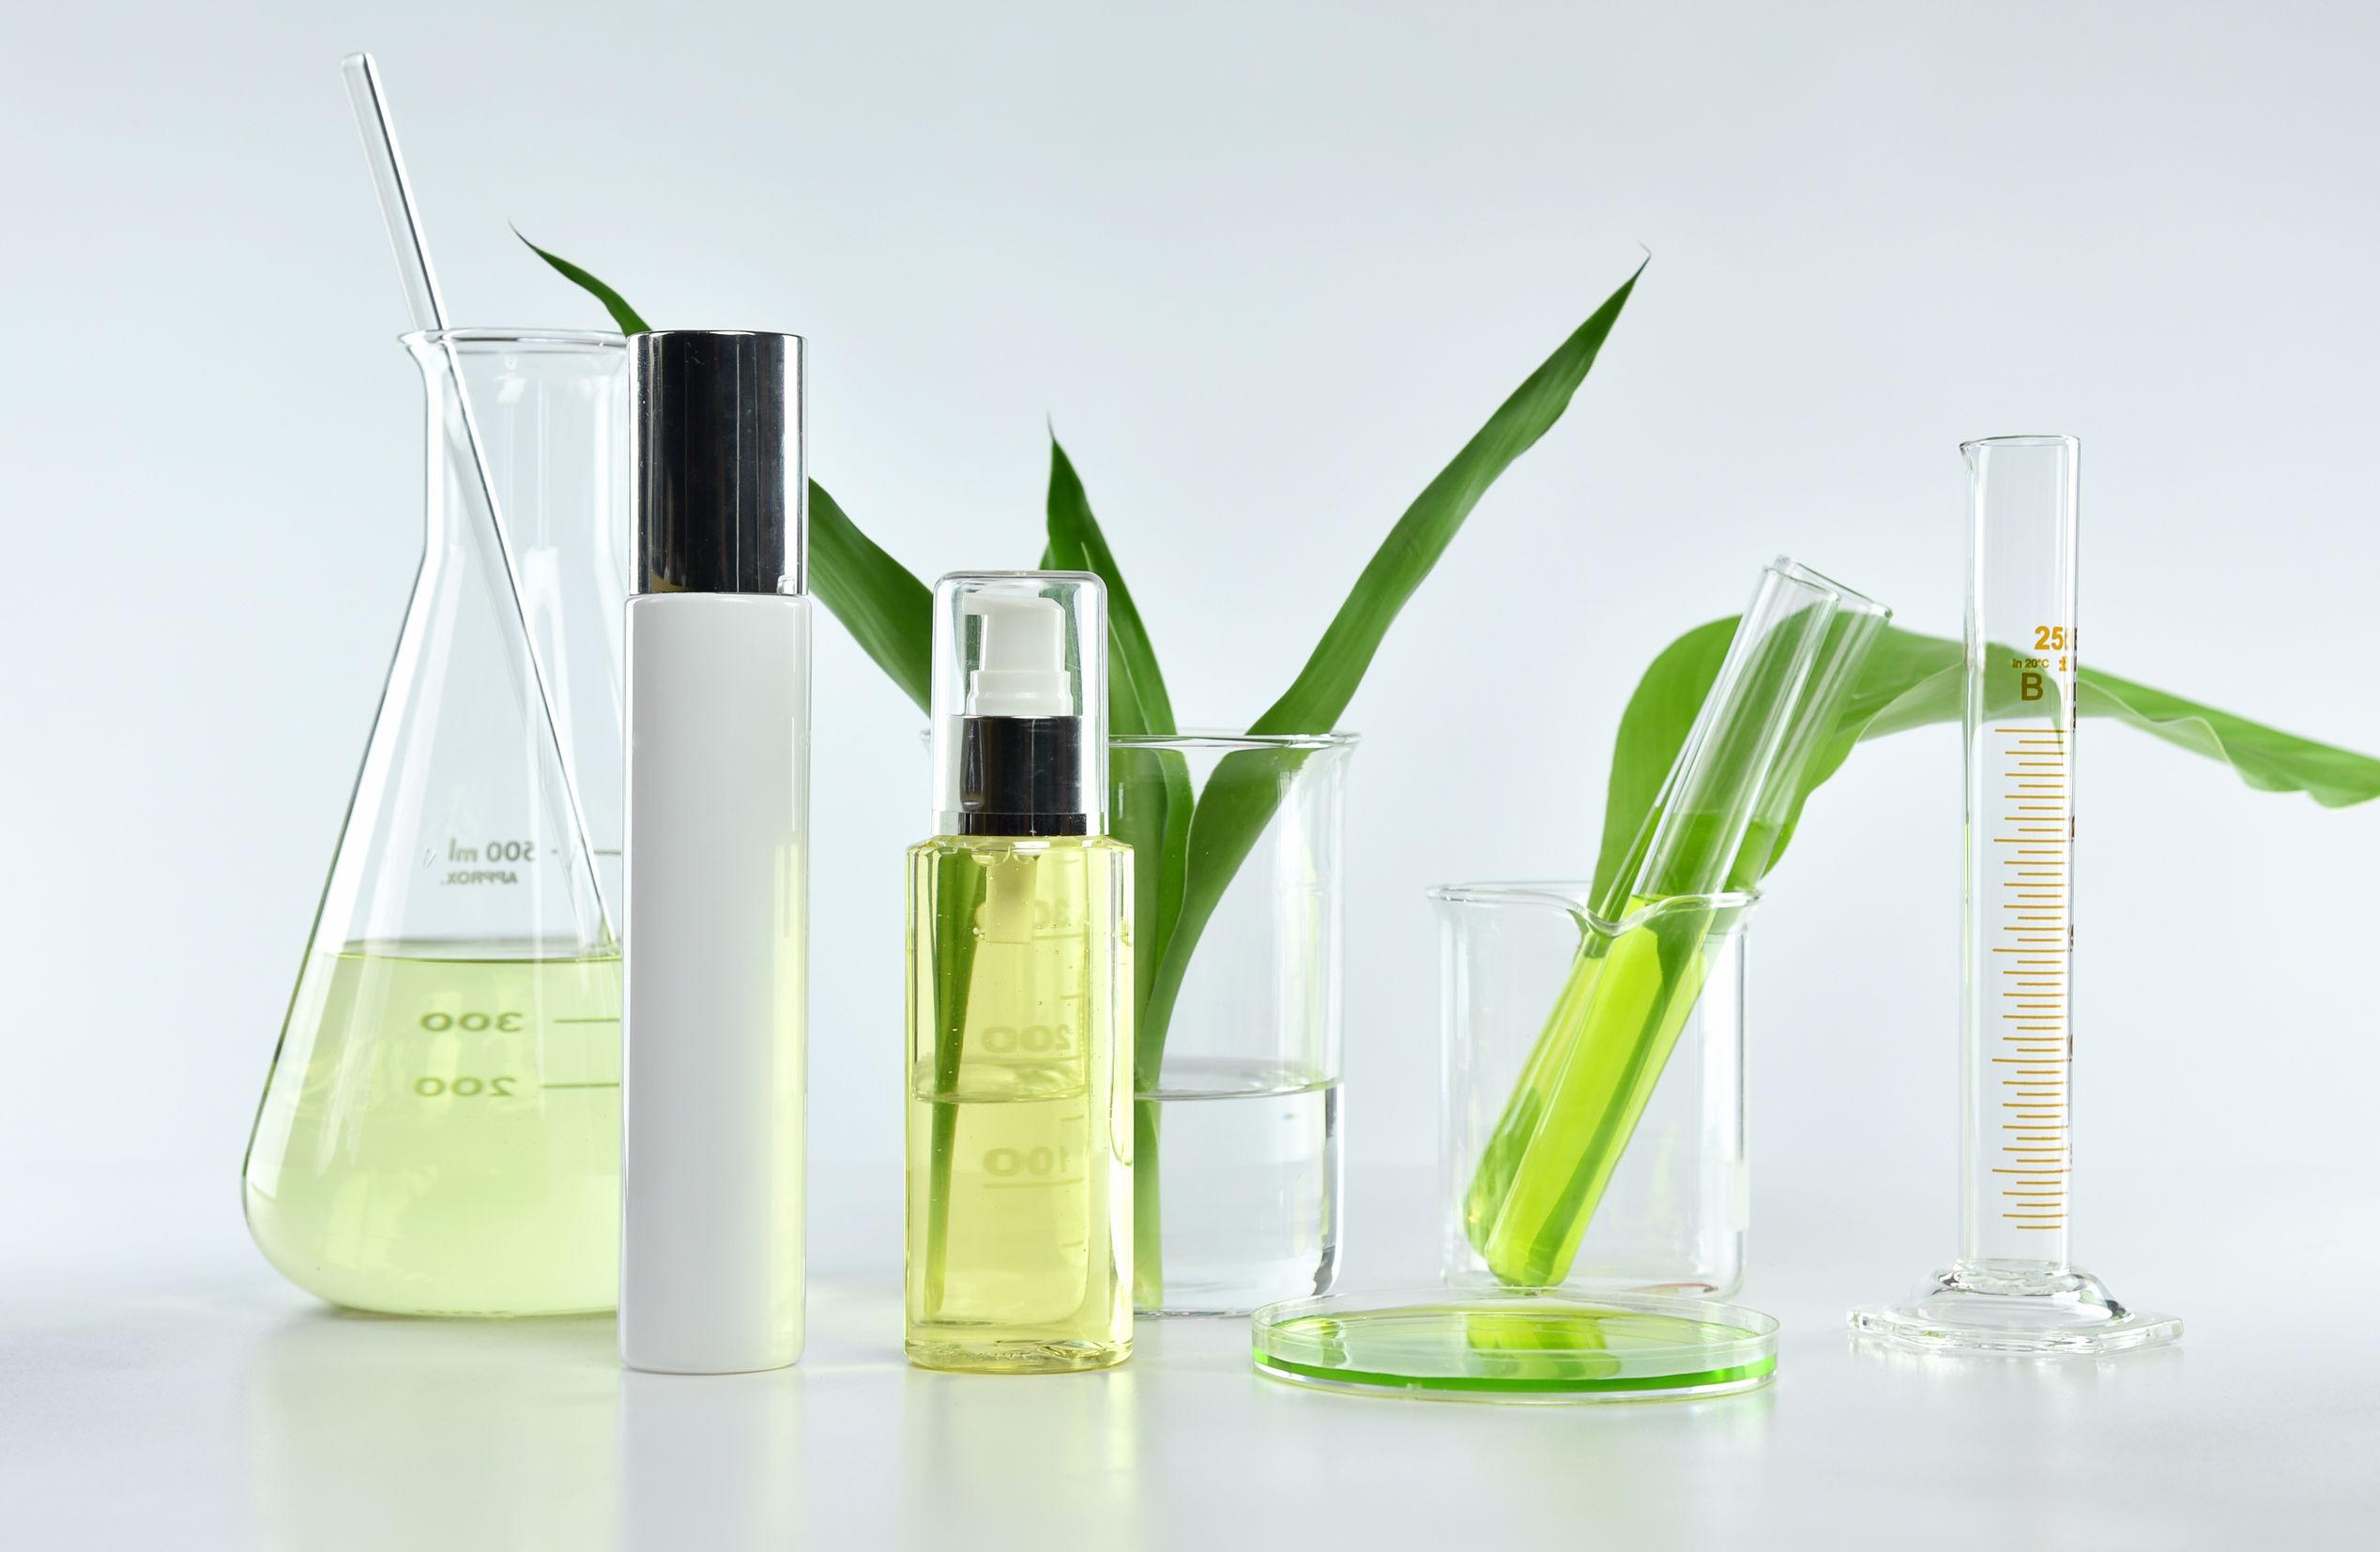 Marca propia de cosmética ecológica